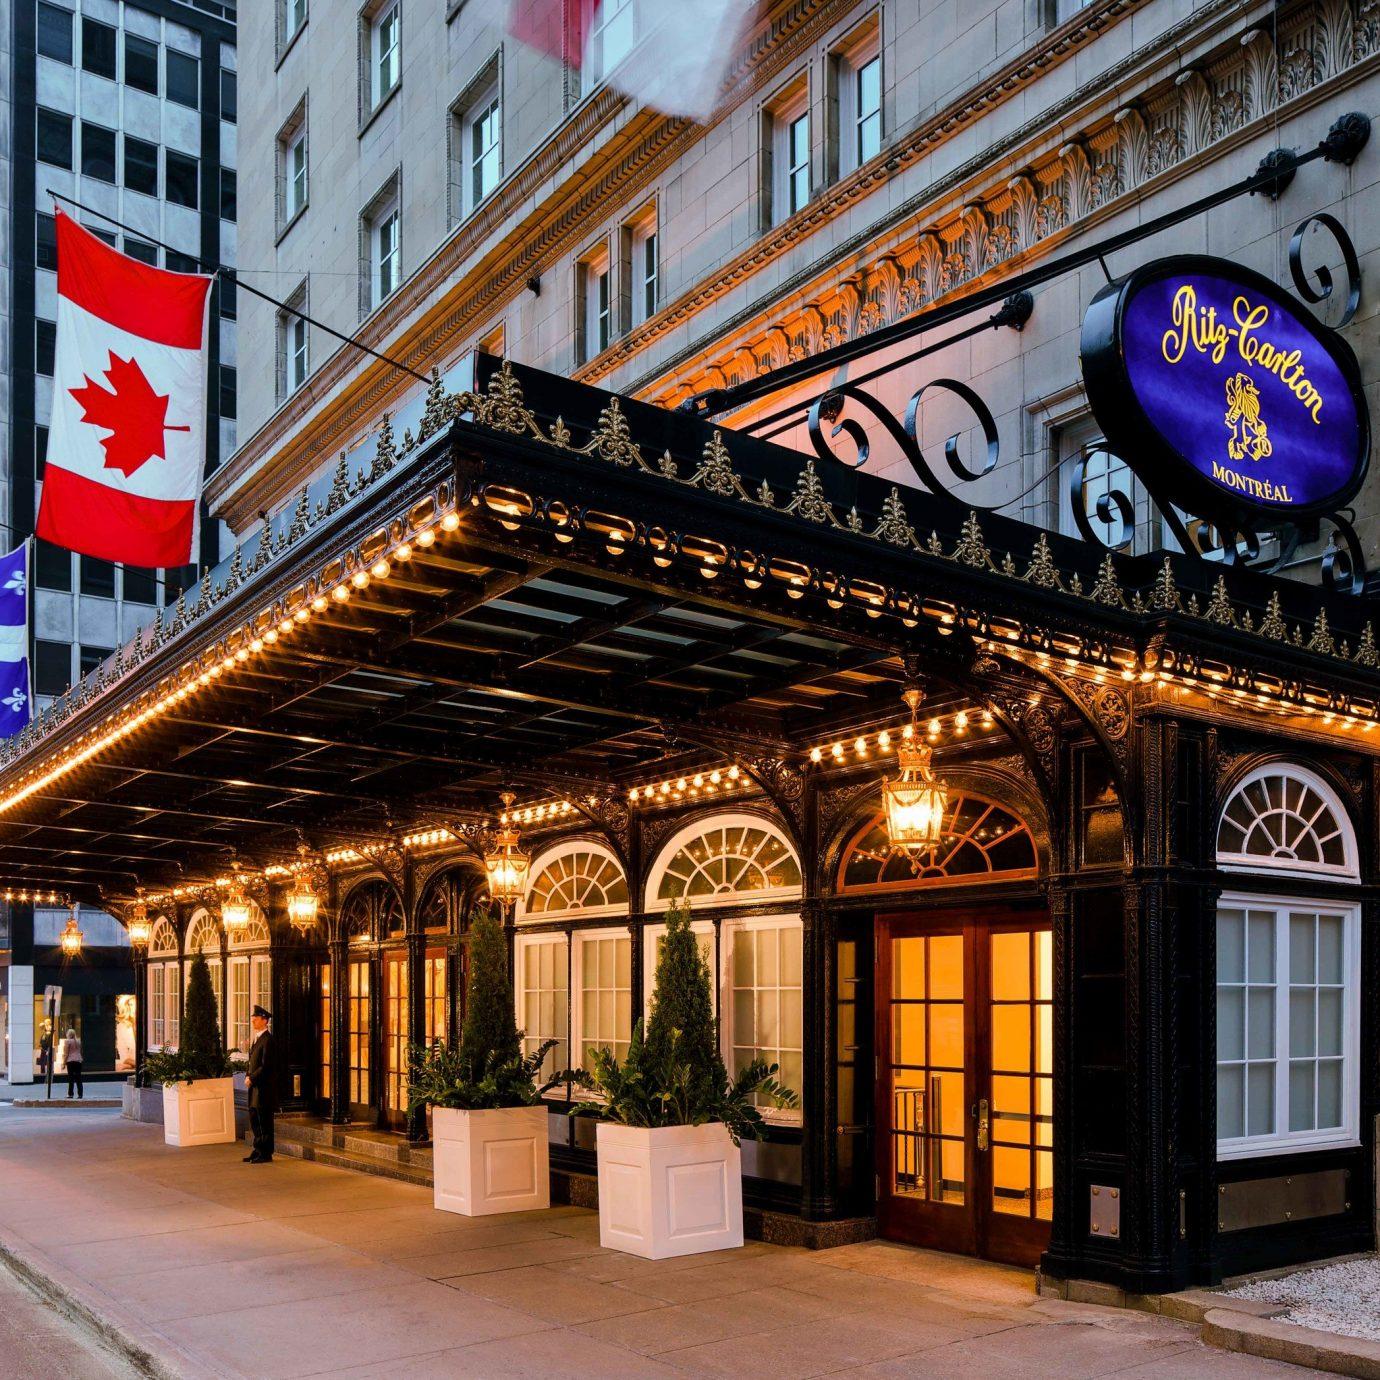 Canada Hotels Montreal Trip Ideas landmark Town City neighbourhood Downtown building mixed use street